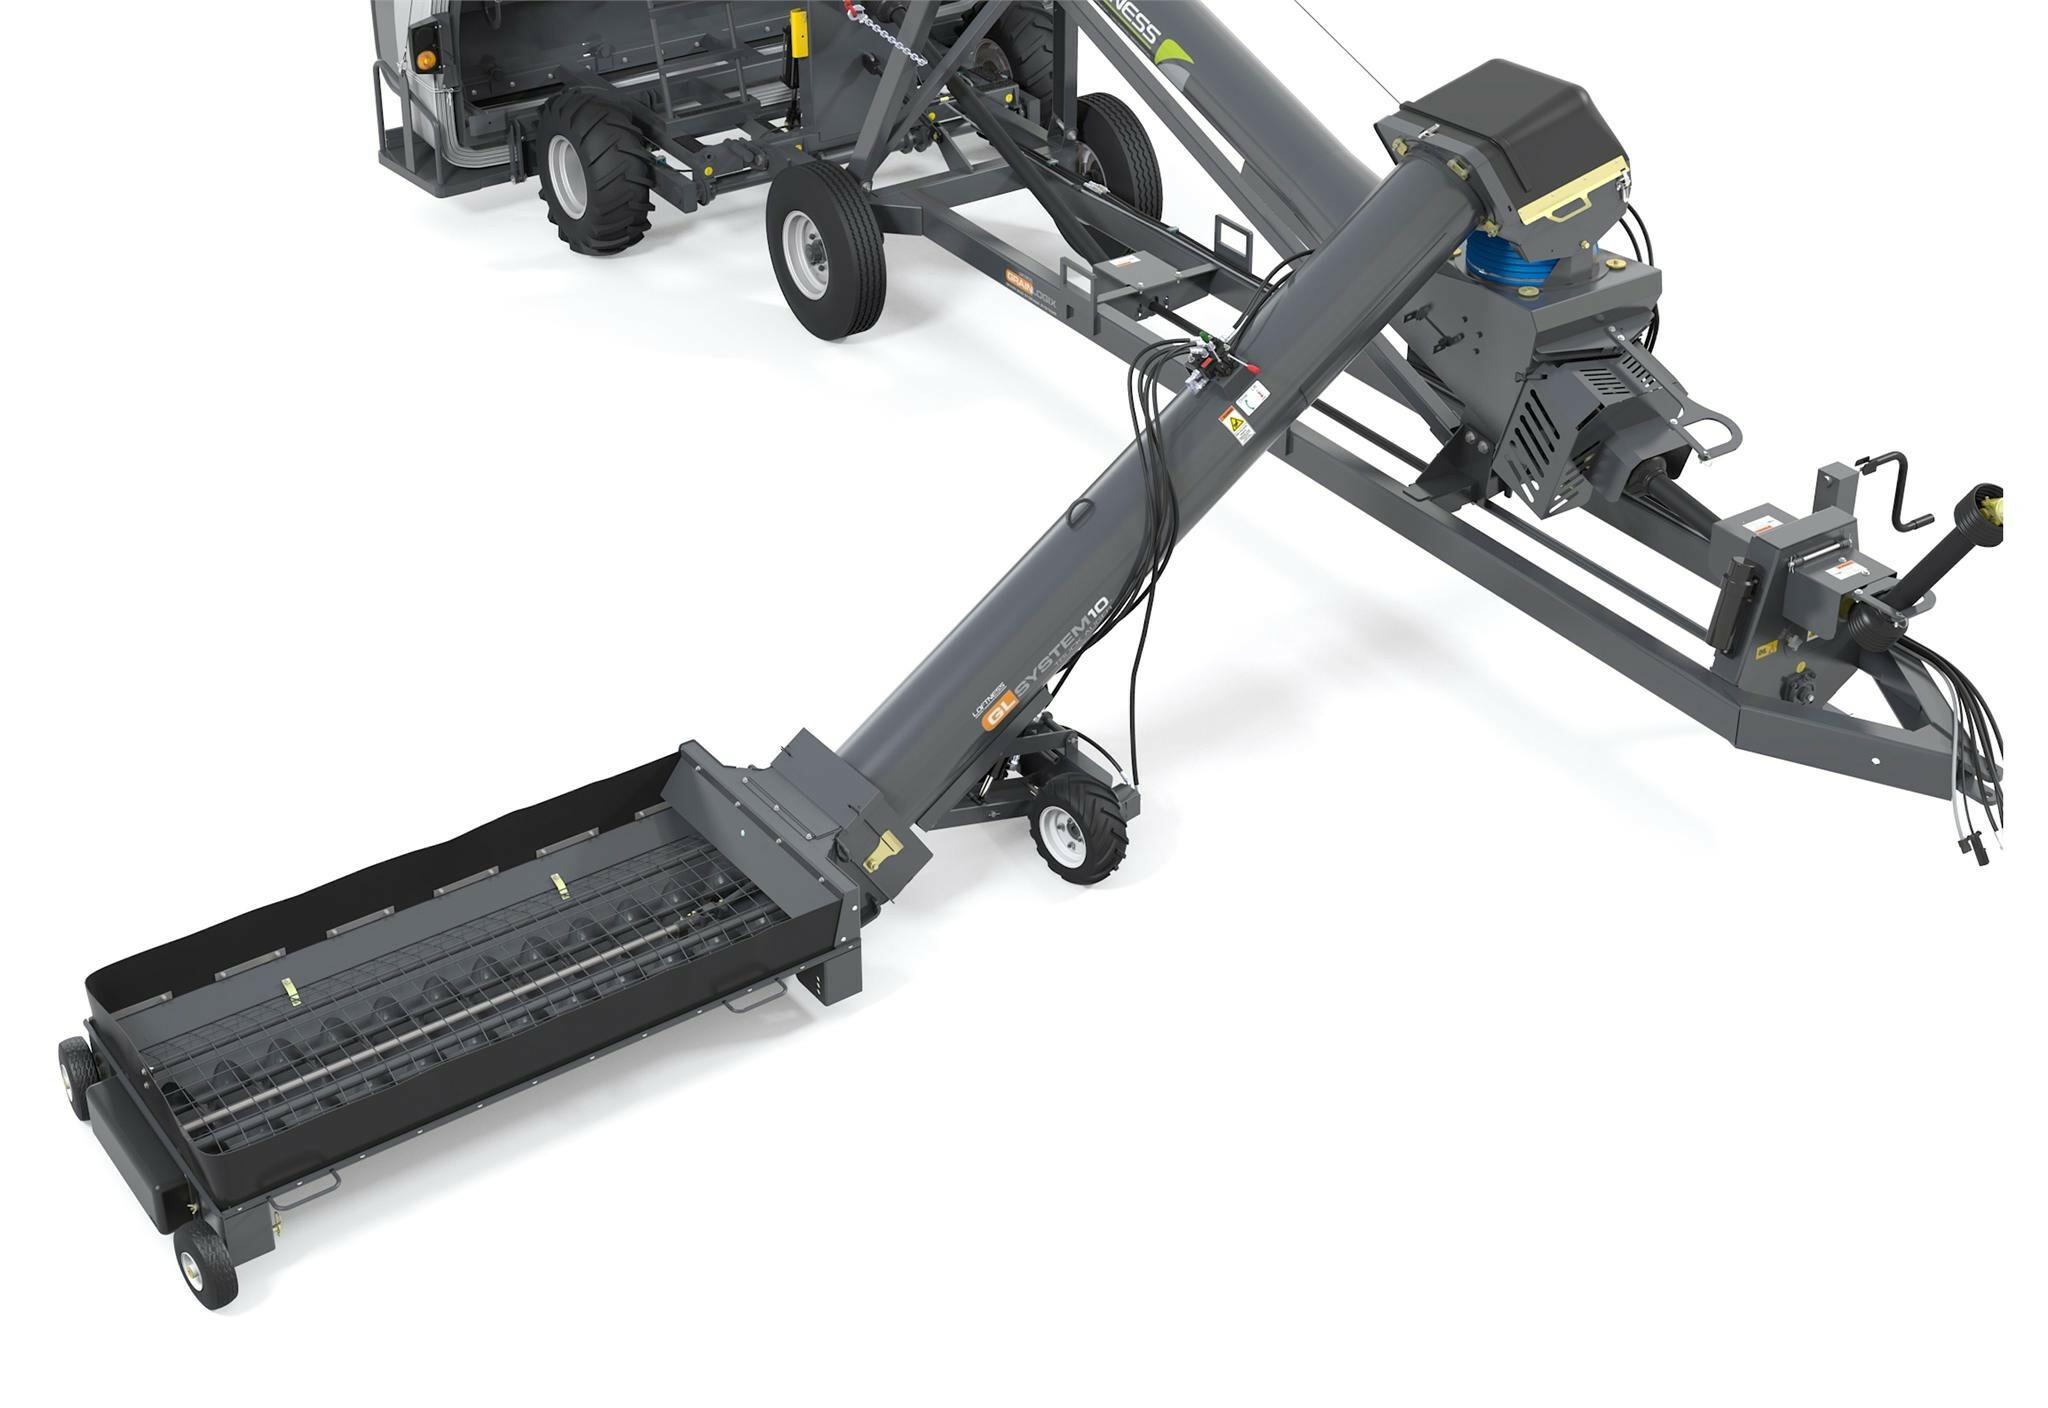 2021 Loftness GBA Augers and Conveyor